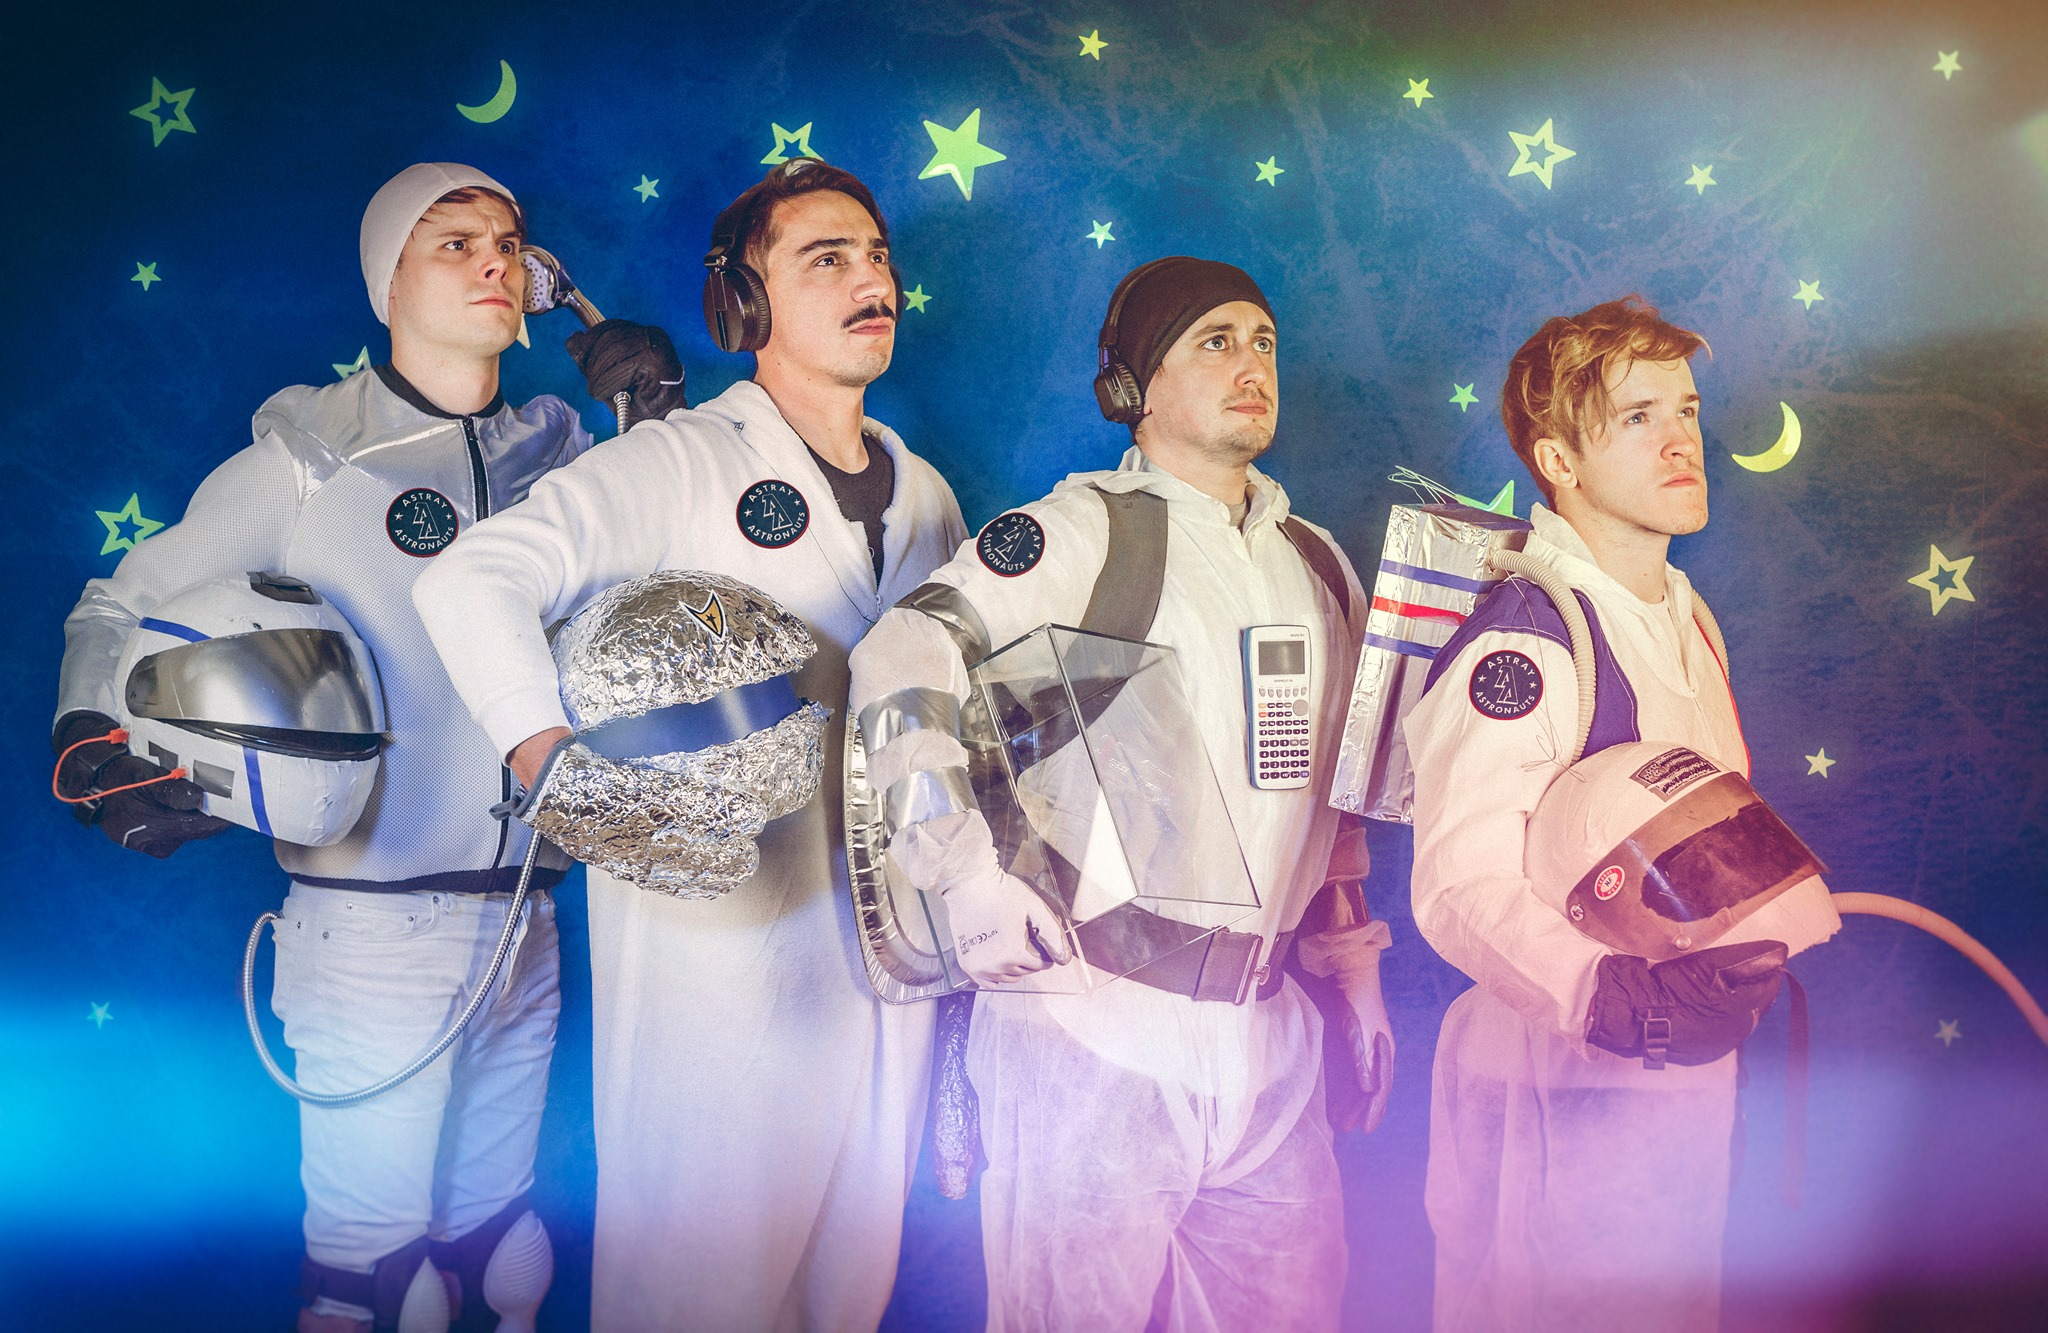 [QHT] Astray Astronauts – 09.09.20